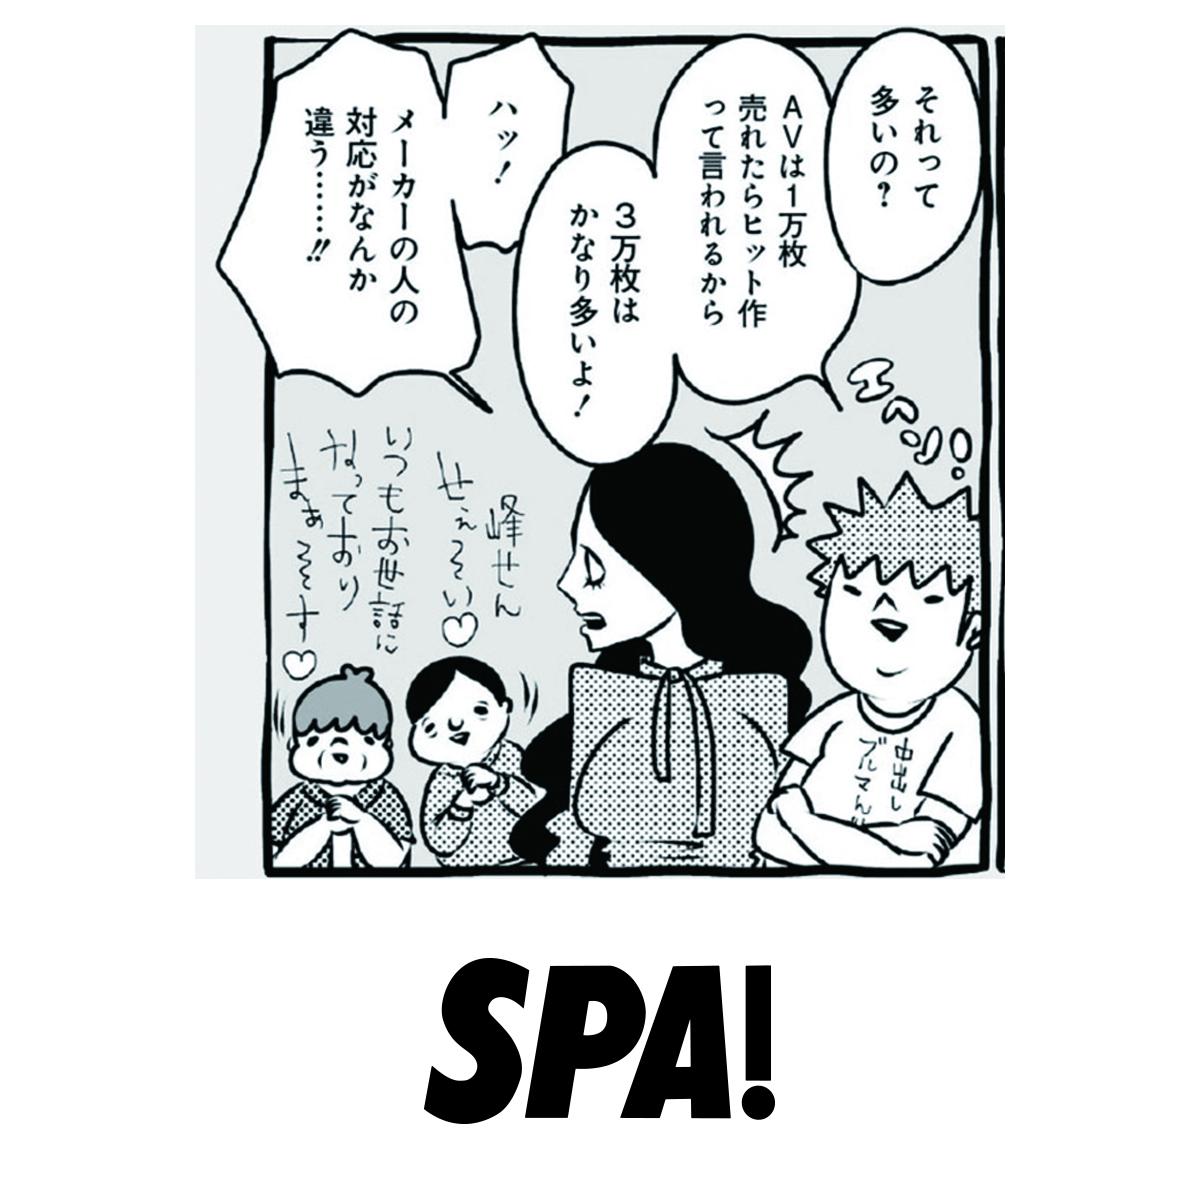 SPA!の『AV女優ちゃん』